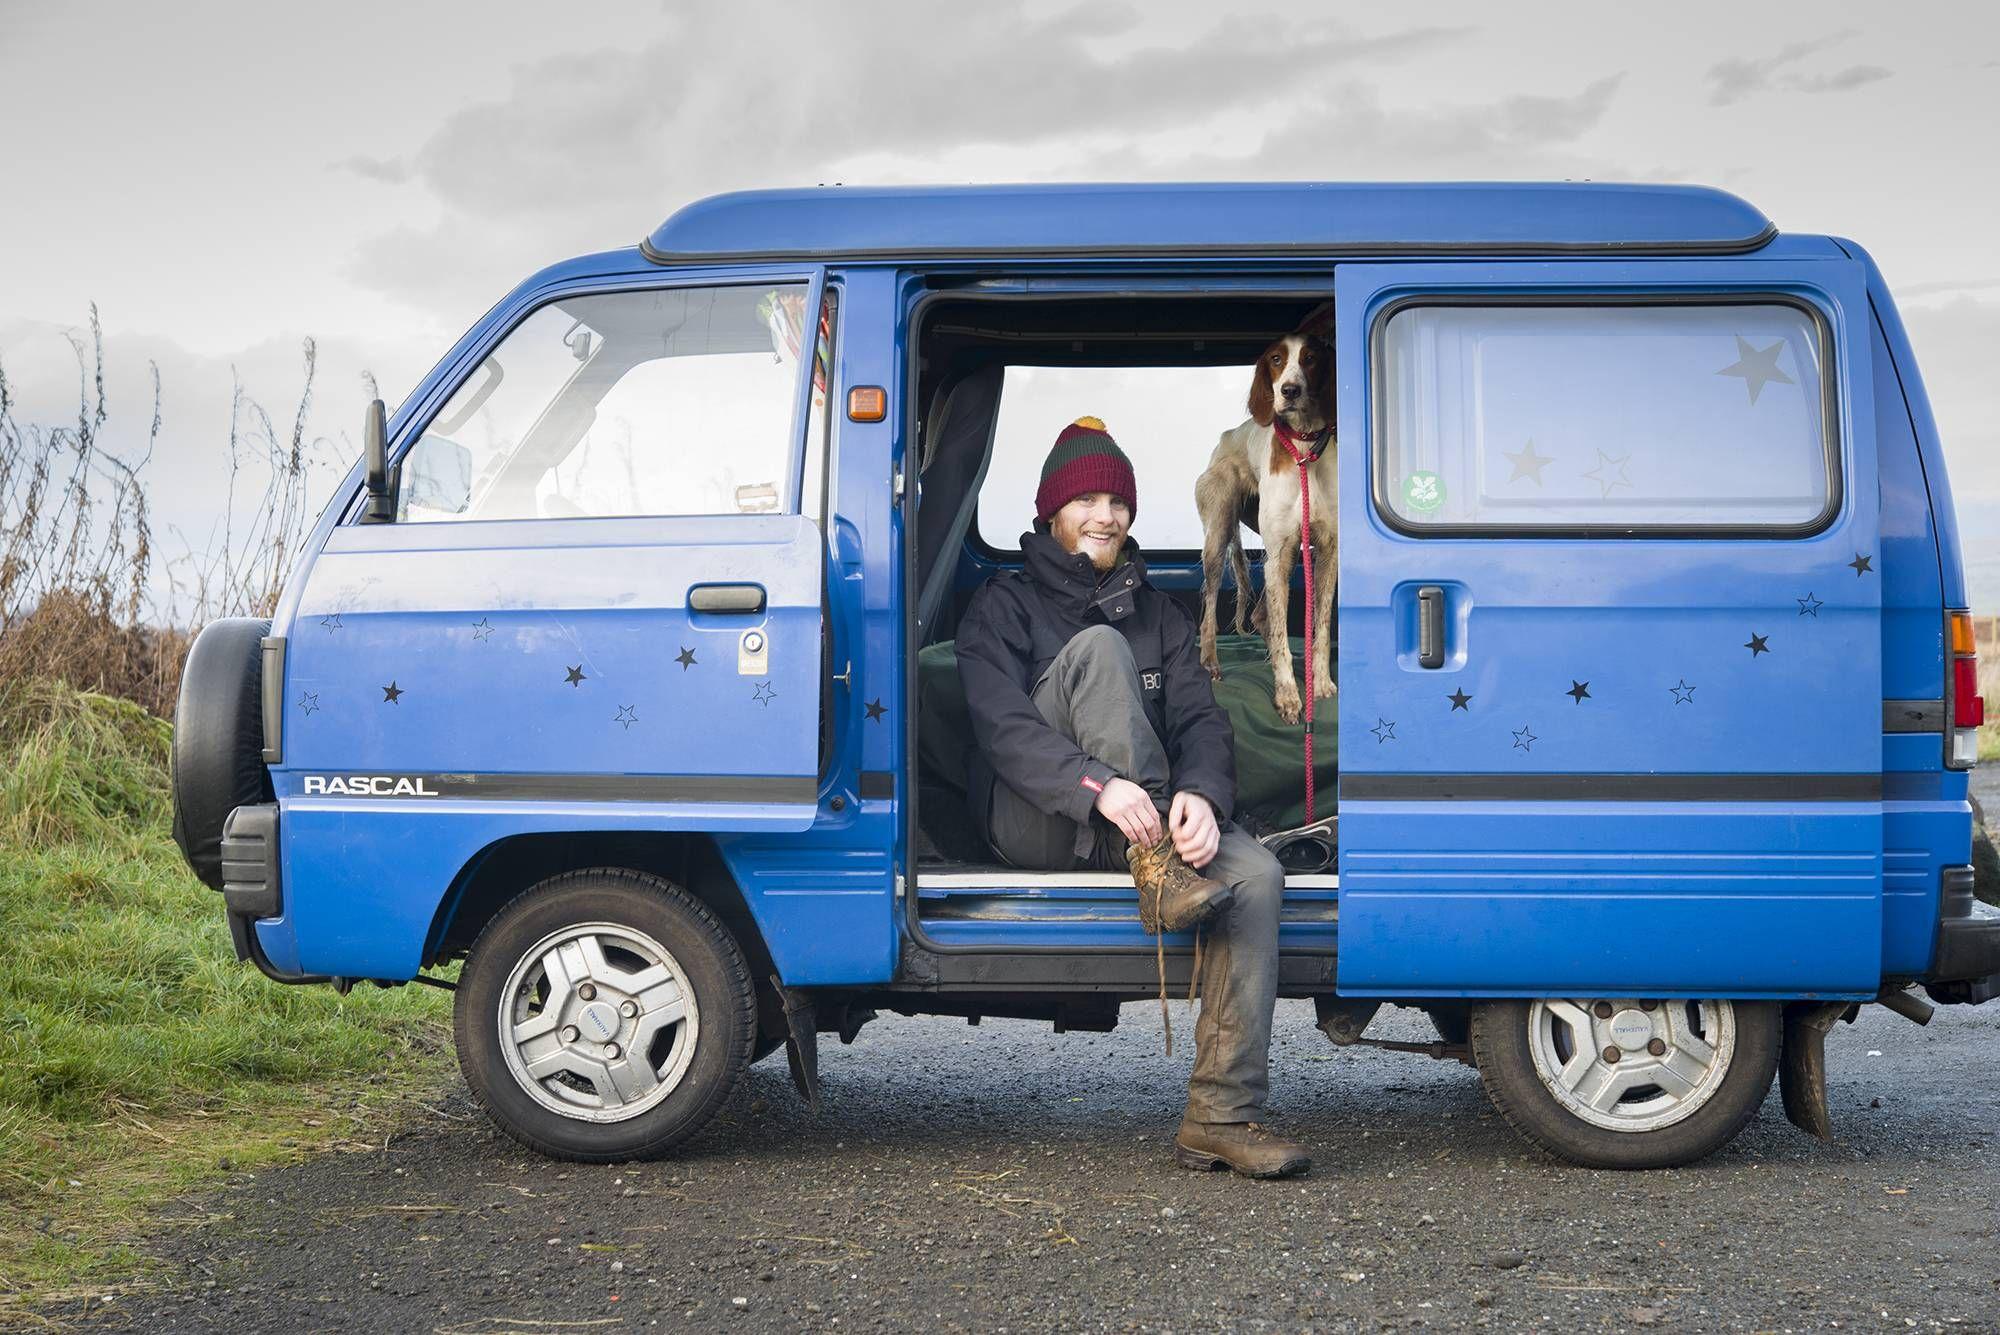 Suzuki Super Carry Surf Buscar Con Google Suzuki Carry Micro Camper Camper Van